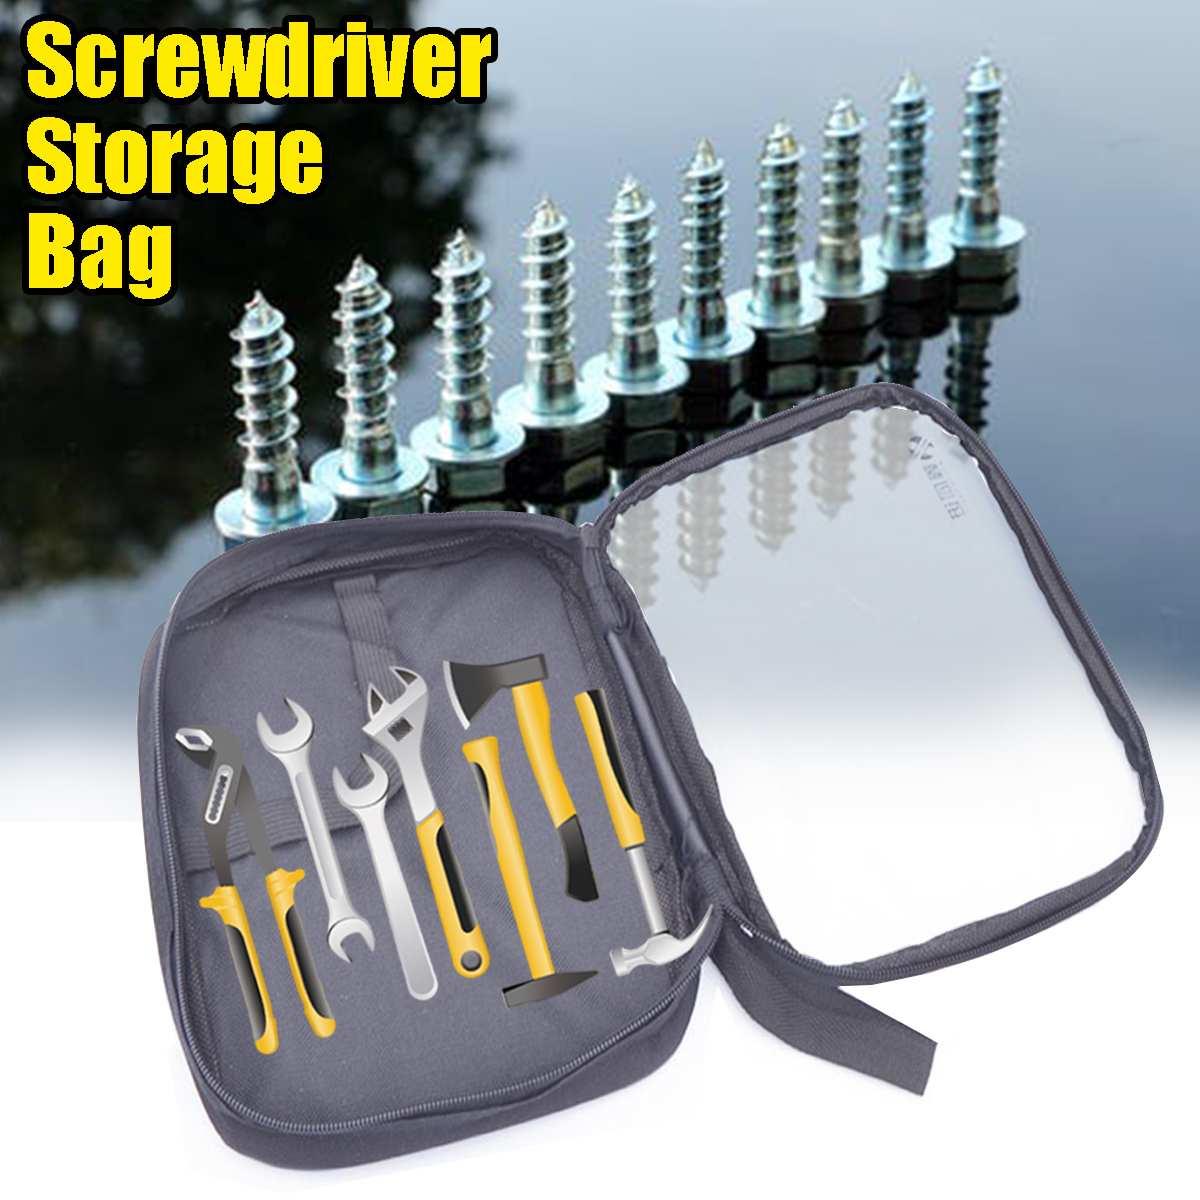 Portable Tool Bag Screwdriver Nuts Drill Pouch Organize Canvas Zipper Storage Bag Small Parts Hand Tool Repair Tools Bag